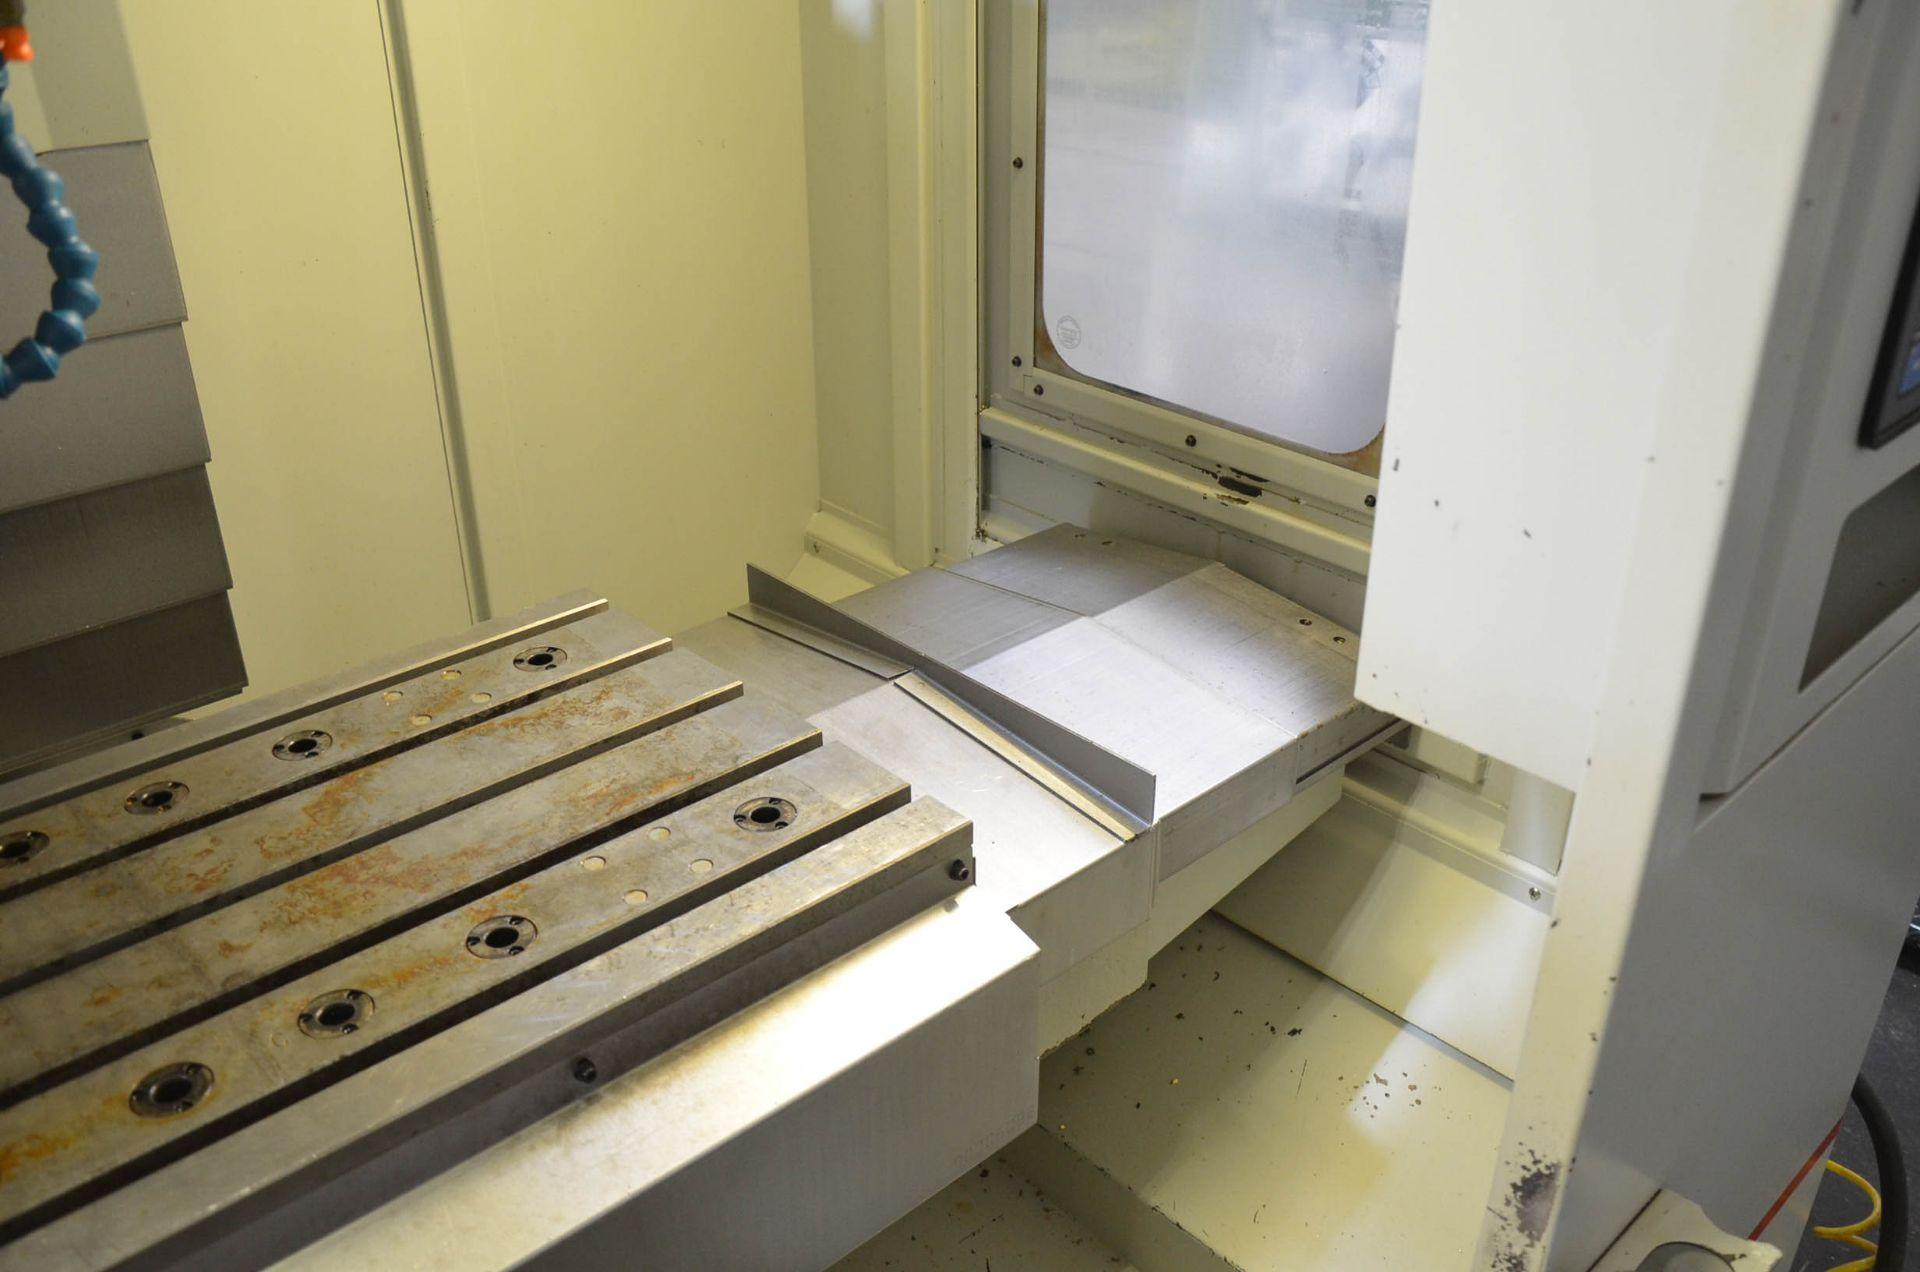 SWI (2014) TRAK LPM 4-AXIS READY CNC VERTICAL MACHINING CENTER WITH PROTO TRAK PMX CNC CONTROL, 19. - Image 10 of 12